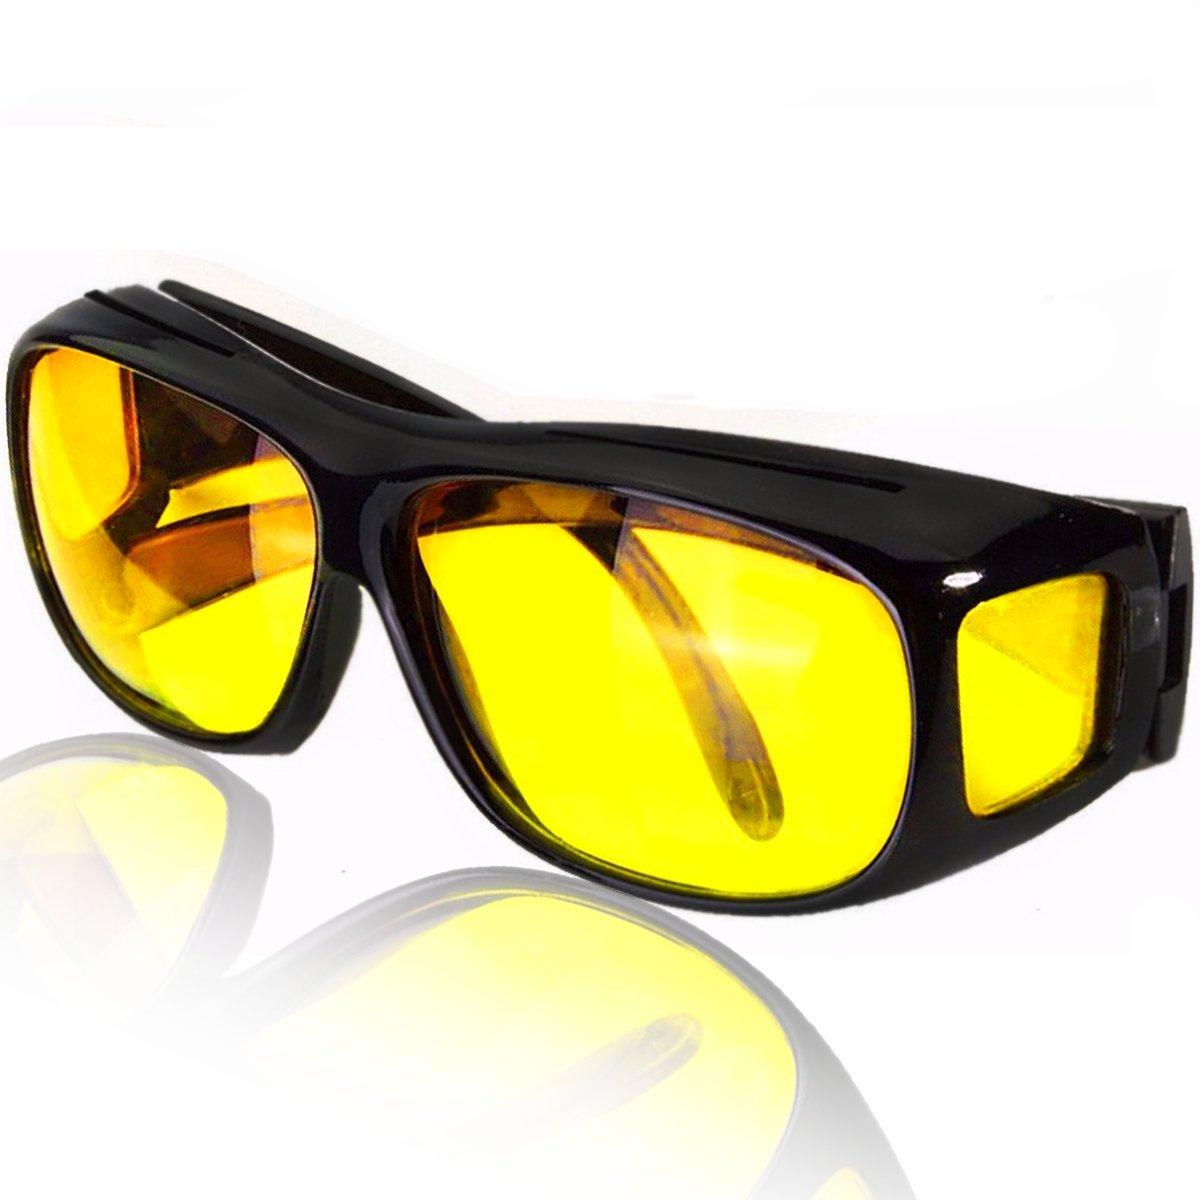 ec8d4e1f39a Amazon.com  Polarized Night Vision Driving Sunglasses